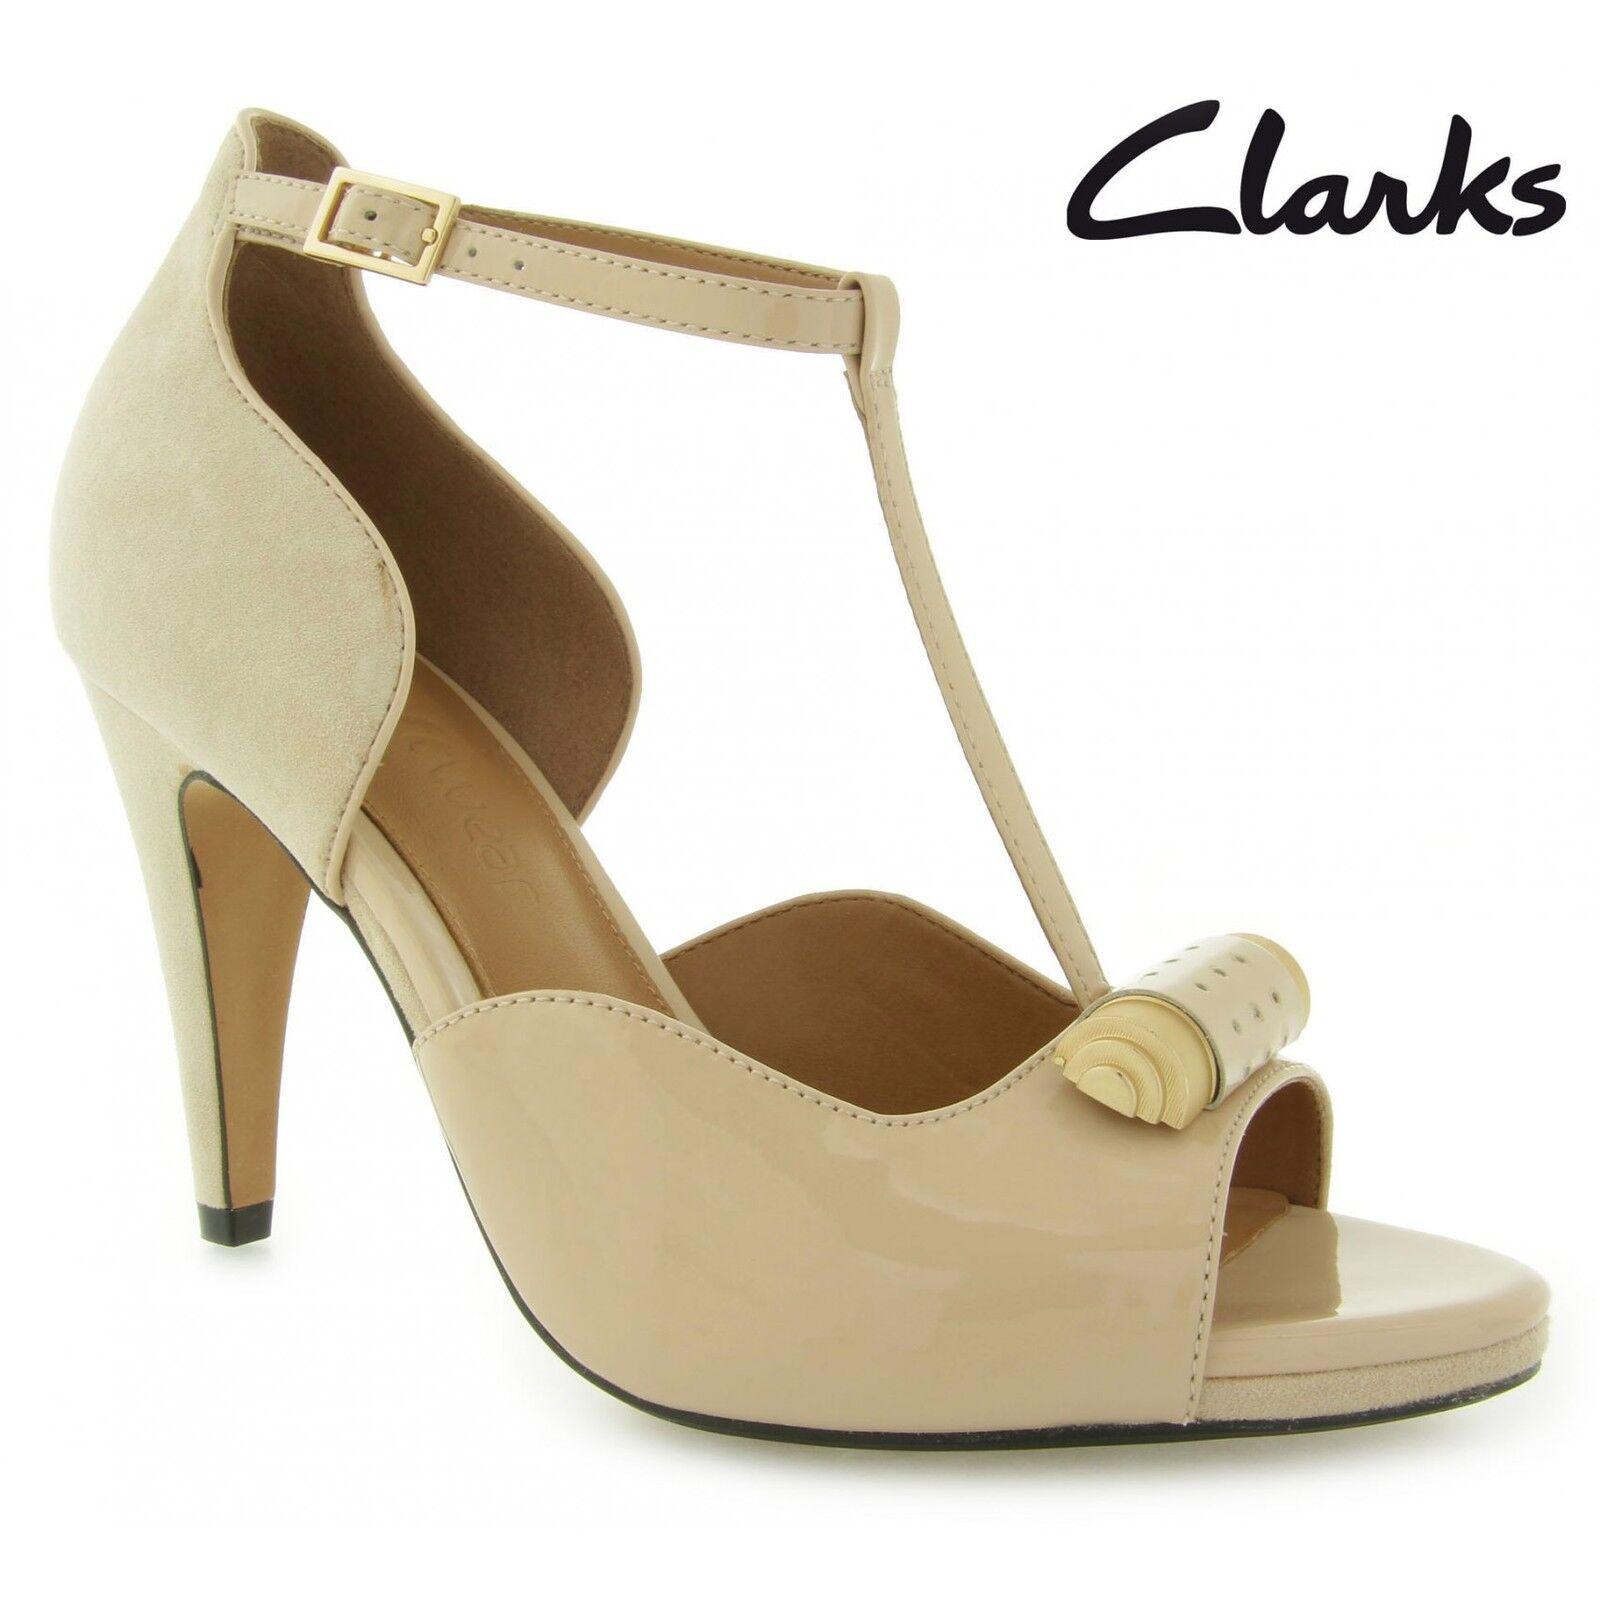 Clarks Damen Leder Saxen Vorhang Hautfarbe Lack Leder Damen UK 3,4,5,6,7,8 862e33